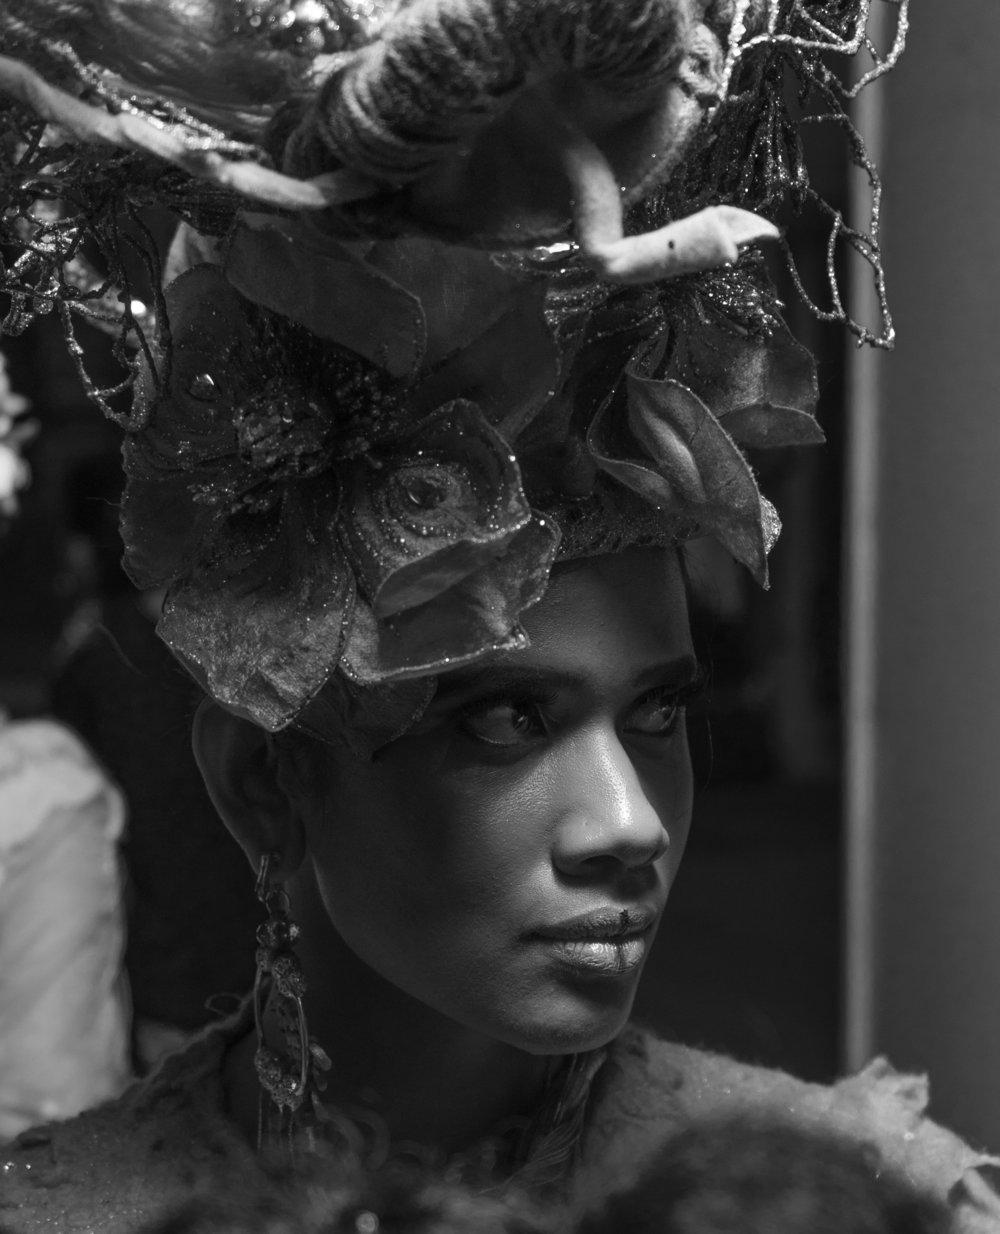 16__Model wearing Honee headdress_.jpg